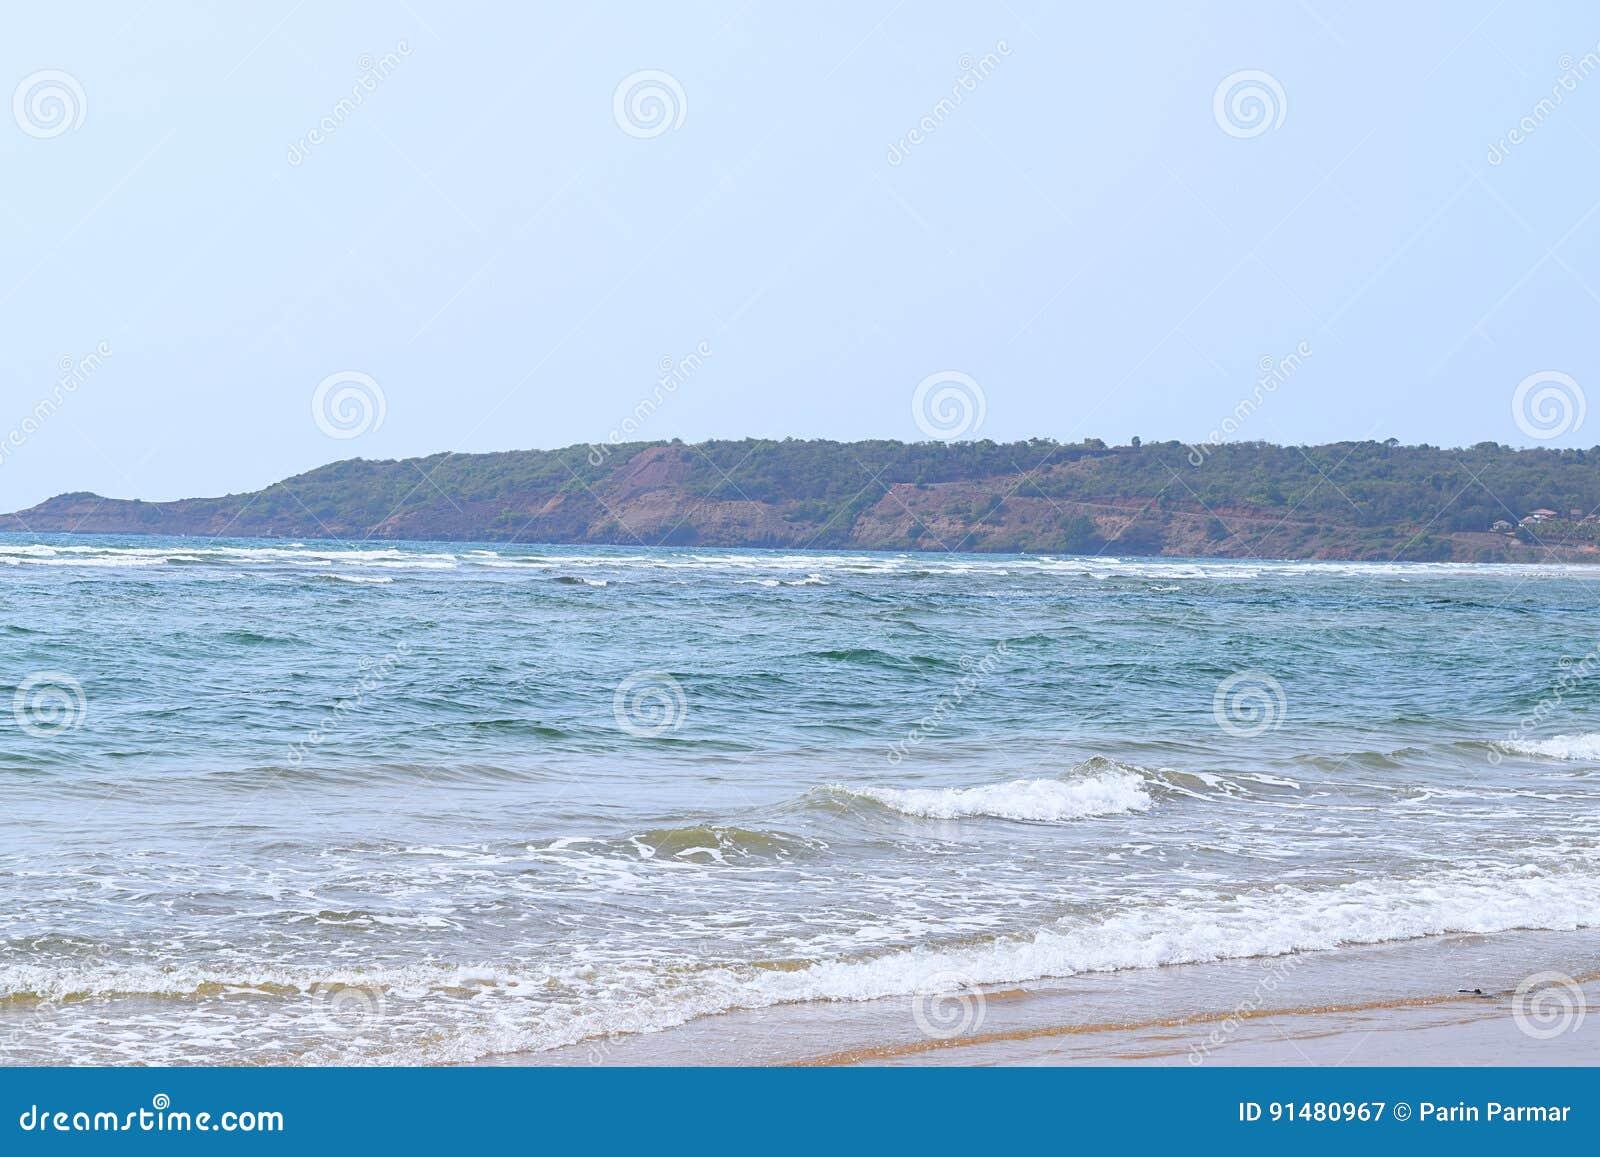 Ware Beach - A Serene and Pristine Beach in Ganpatipule, Ratnagiri, Maharashtra, India